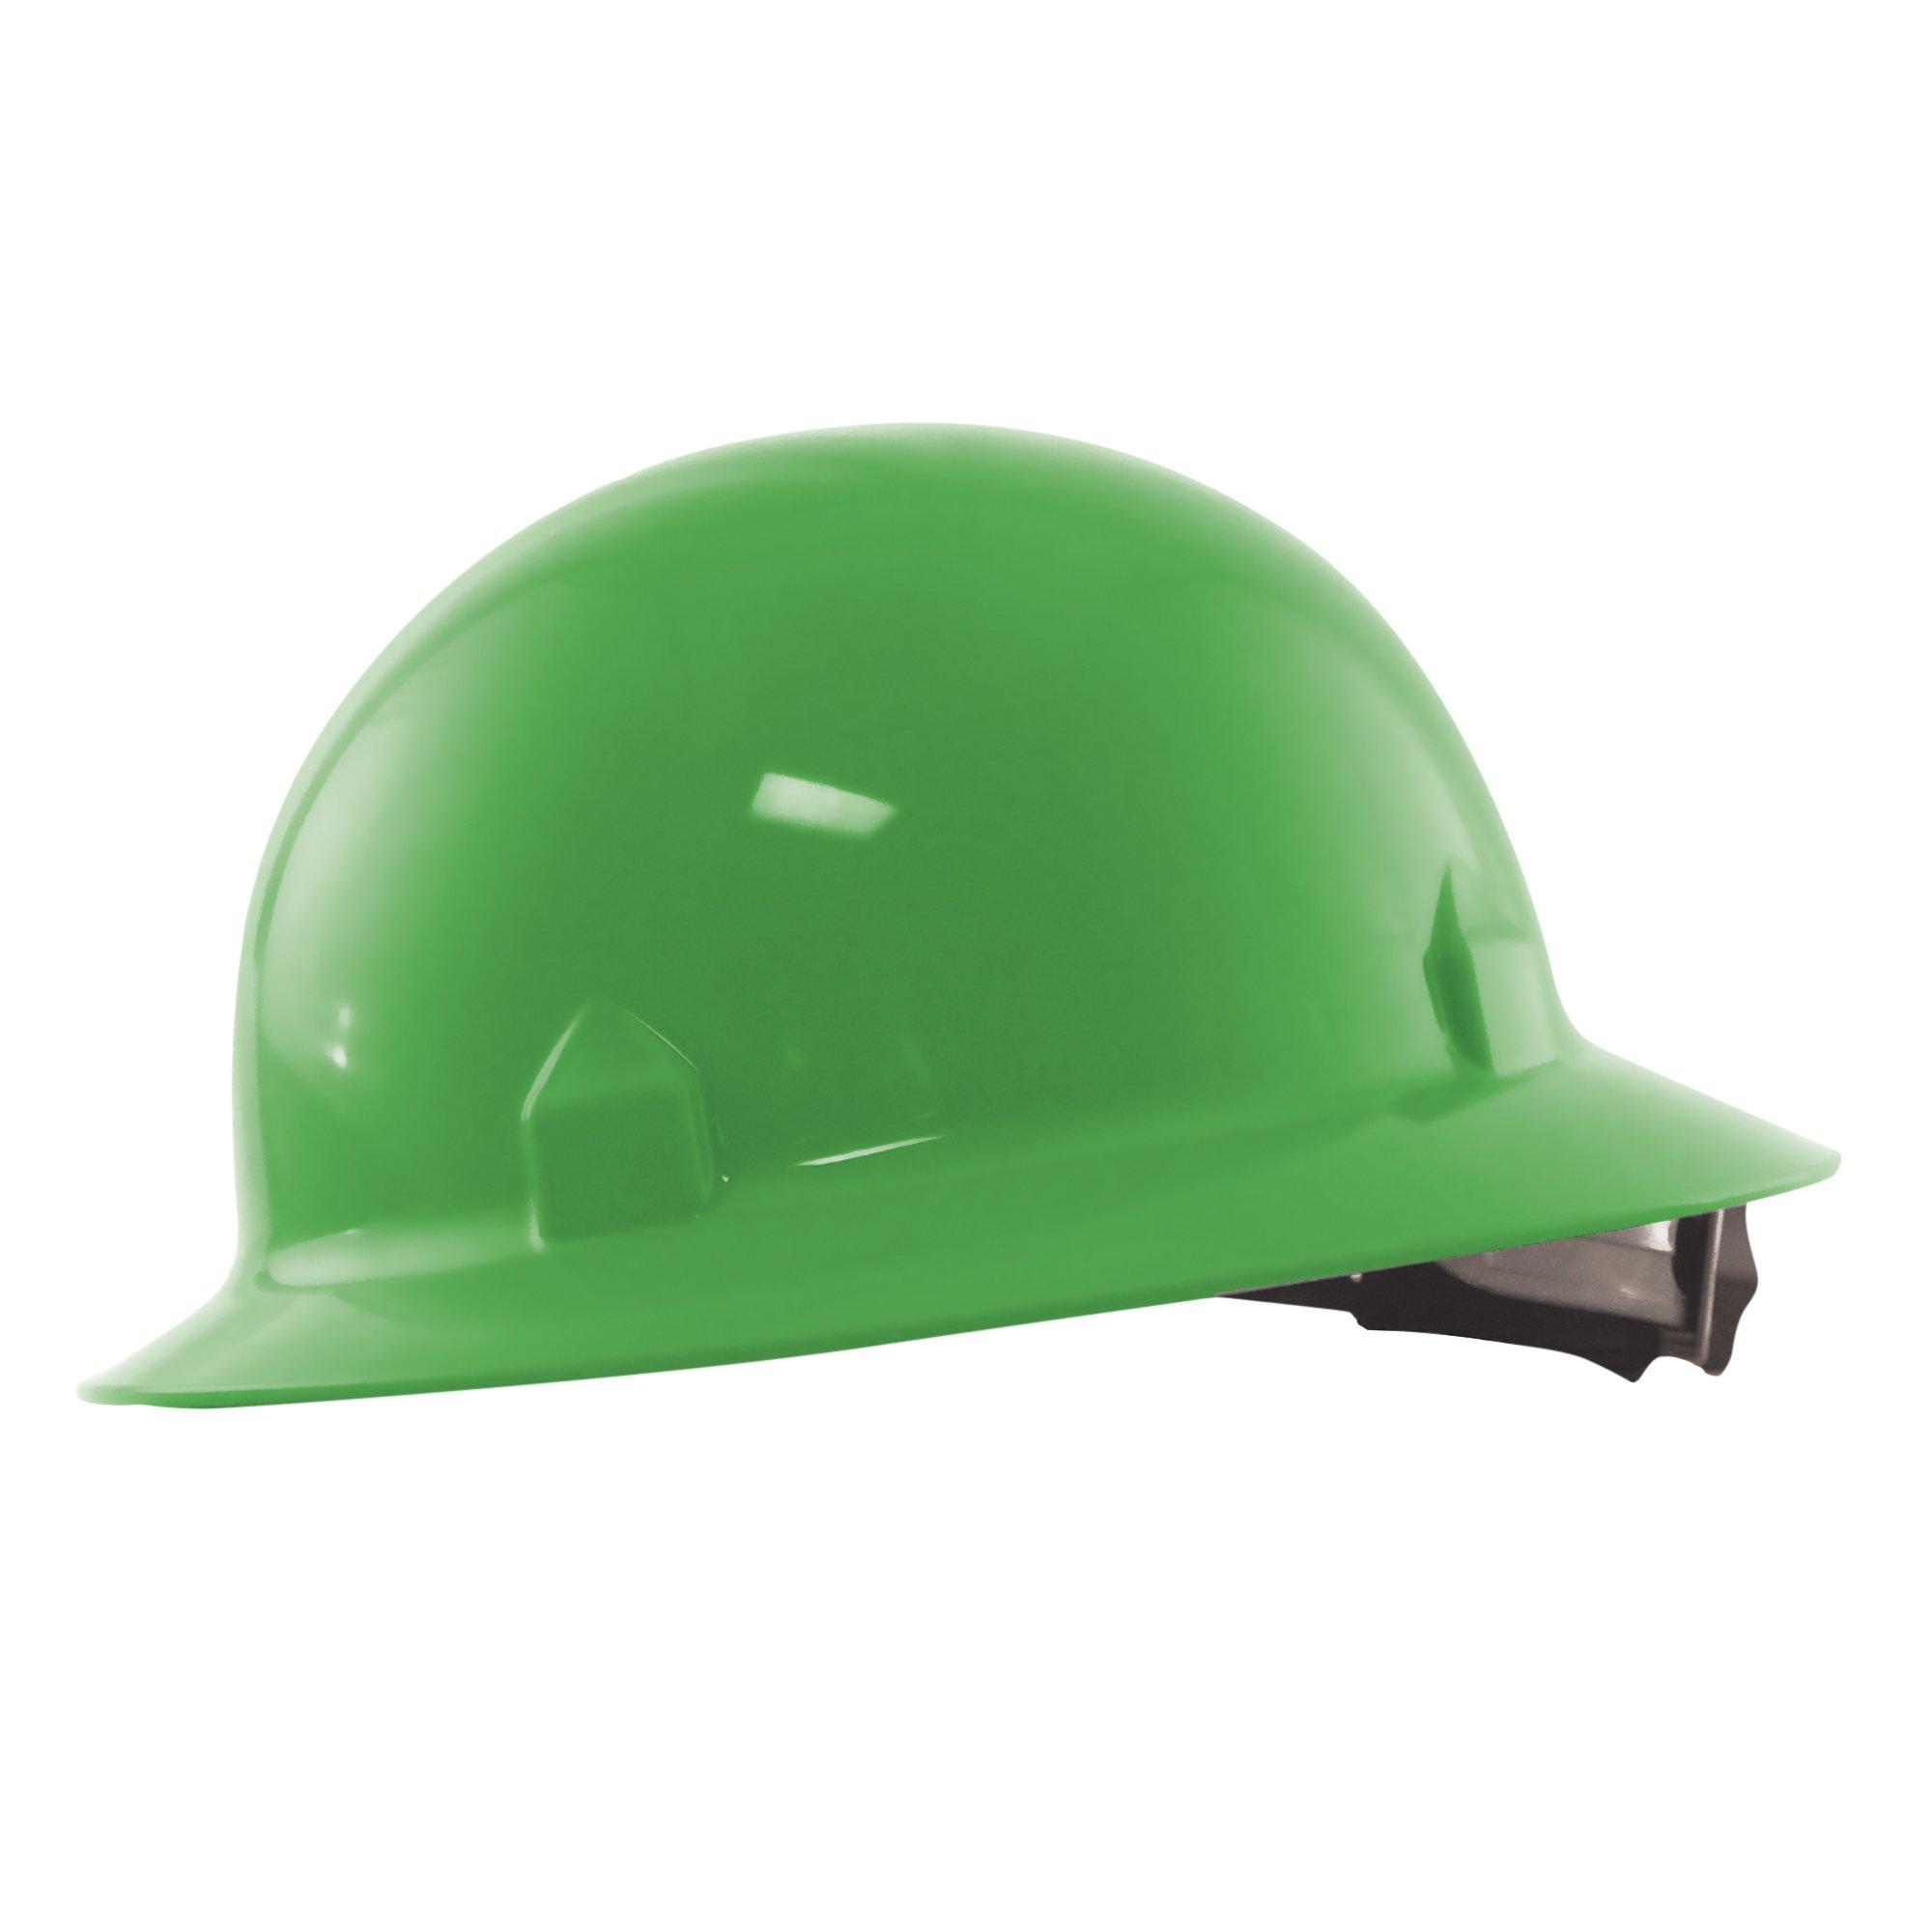 Jackson Safety Blockhead Full Brim Hard Hat (20718), 360-Degree Brim, 8-Point Ratchet Suspension, Green, 12/ Case